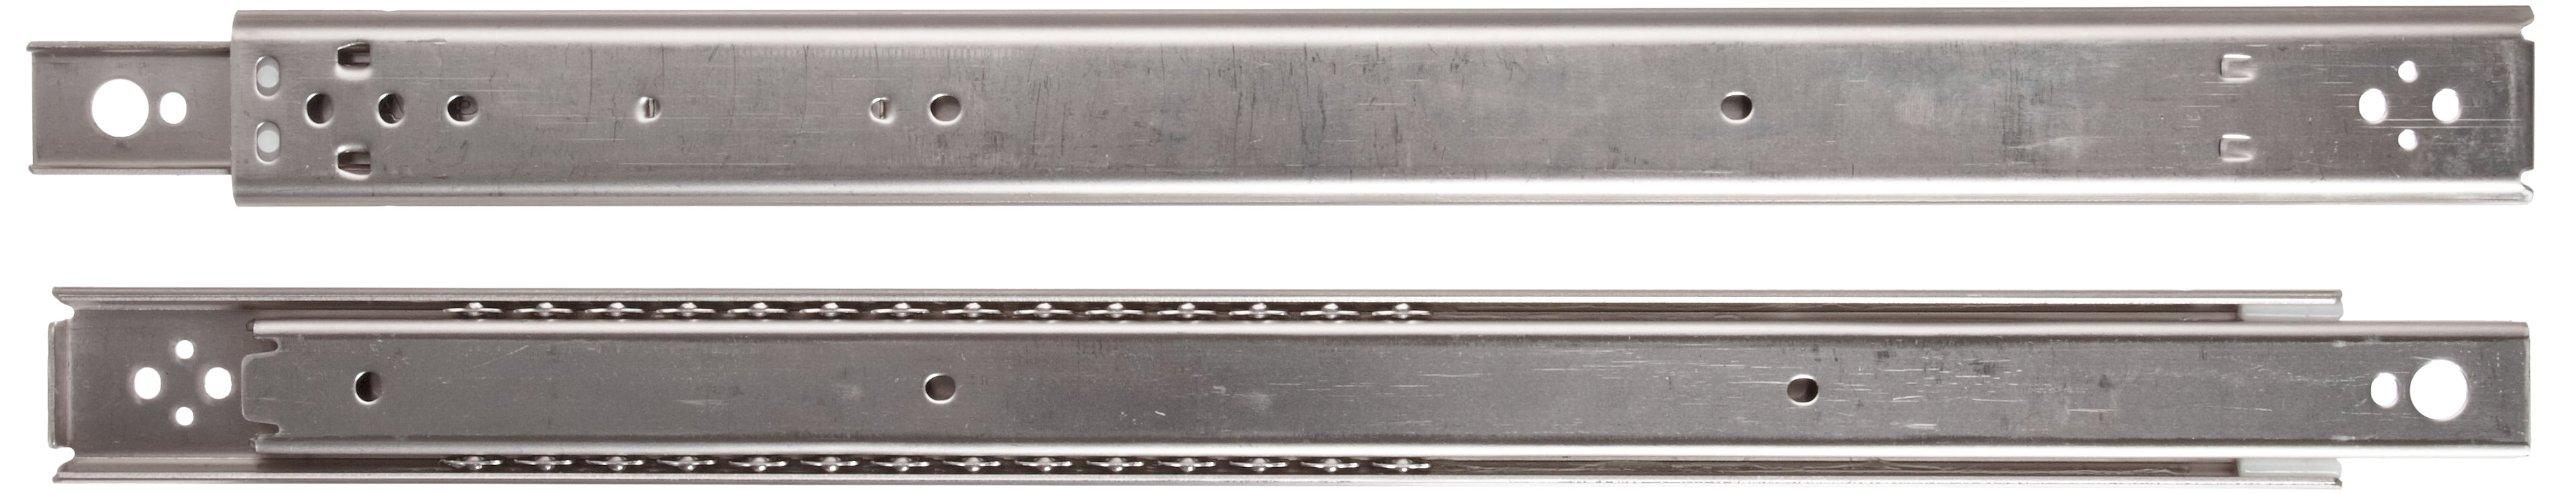 Sugastune ESR-1 304 Stainless Steel Drawer Slide, 3/4 Extension, Friction Brake Stop, 28'' Closed, 20'' Travel, 55 lbs/Pack Ld Cap (1 Pair)